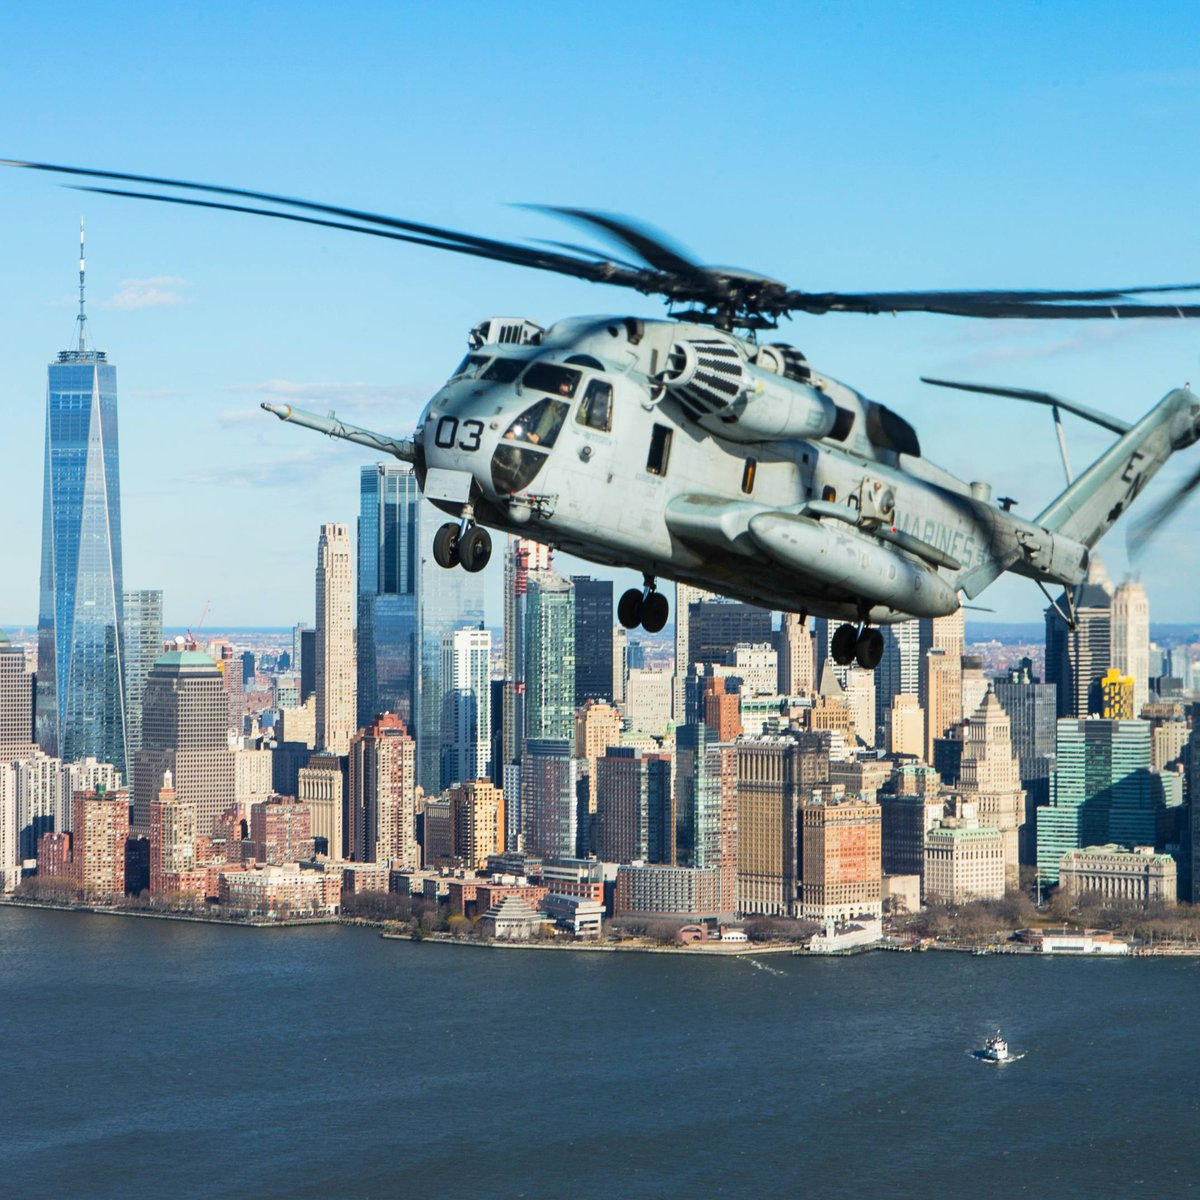 CH-53E over NYC . . . . . #Stallion #SuperStallion #CH53 #CH53 #CH53ESuperStallion #Marines #MarineCorps #USMarines #USMC #SemperFi #MilitaryPhotography #Aviation #AviationLife #Pilot #PilotLife #AviationPhotography #Air #GetToTheChopper #Badass #USA #MilitaryMachine